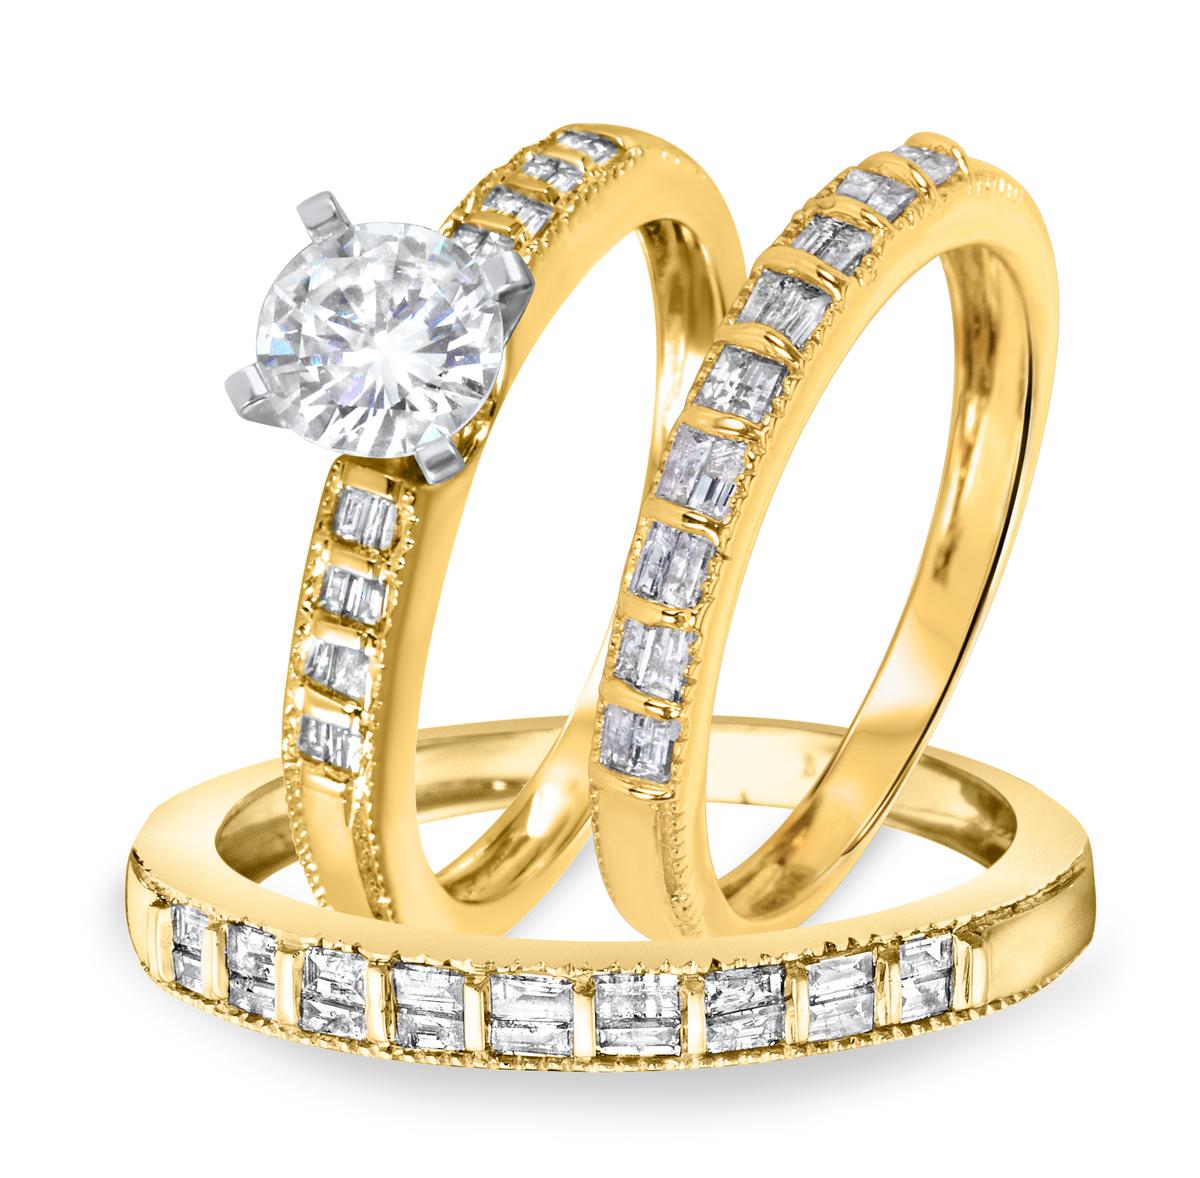 1 3/8 CT. T.W. Diamond Ladies Engagement Ring, Wedding Band, Men's Wedding Band